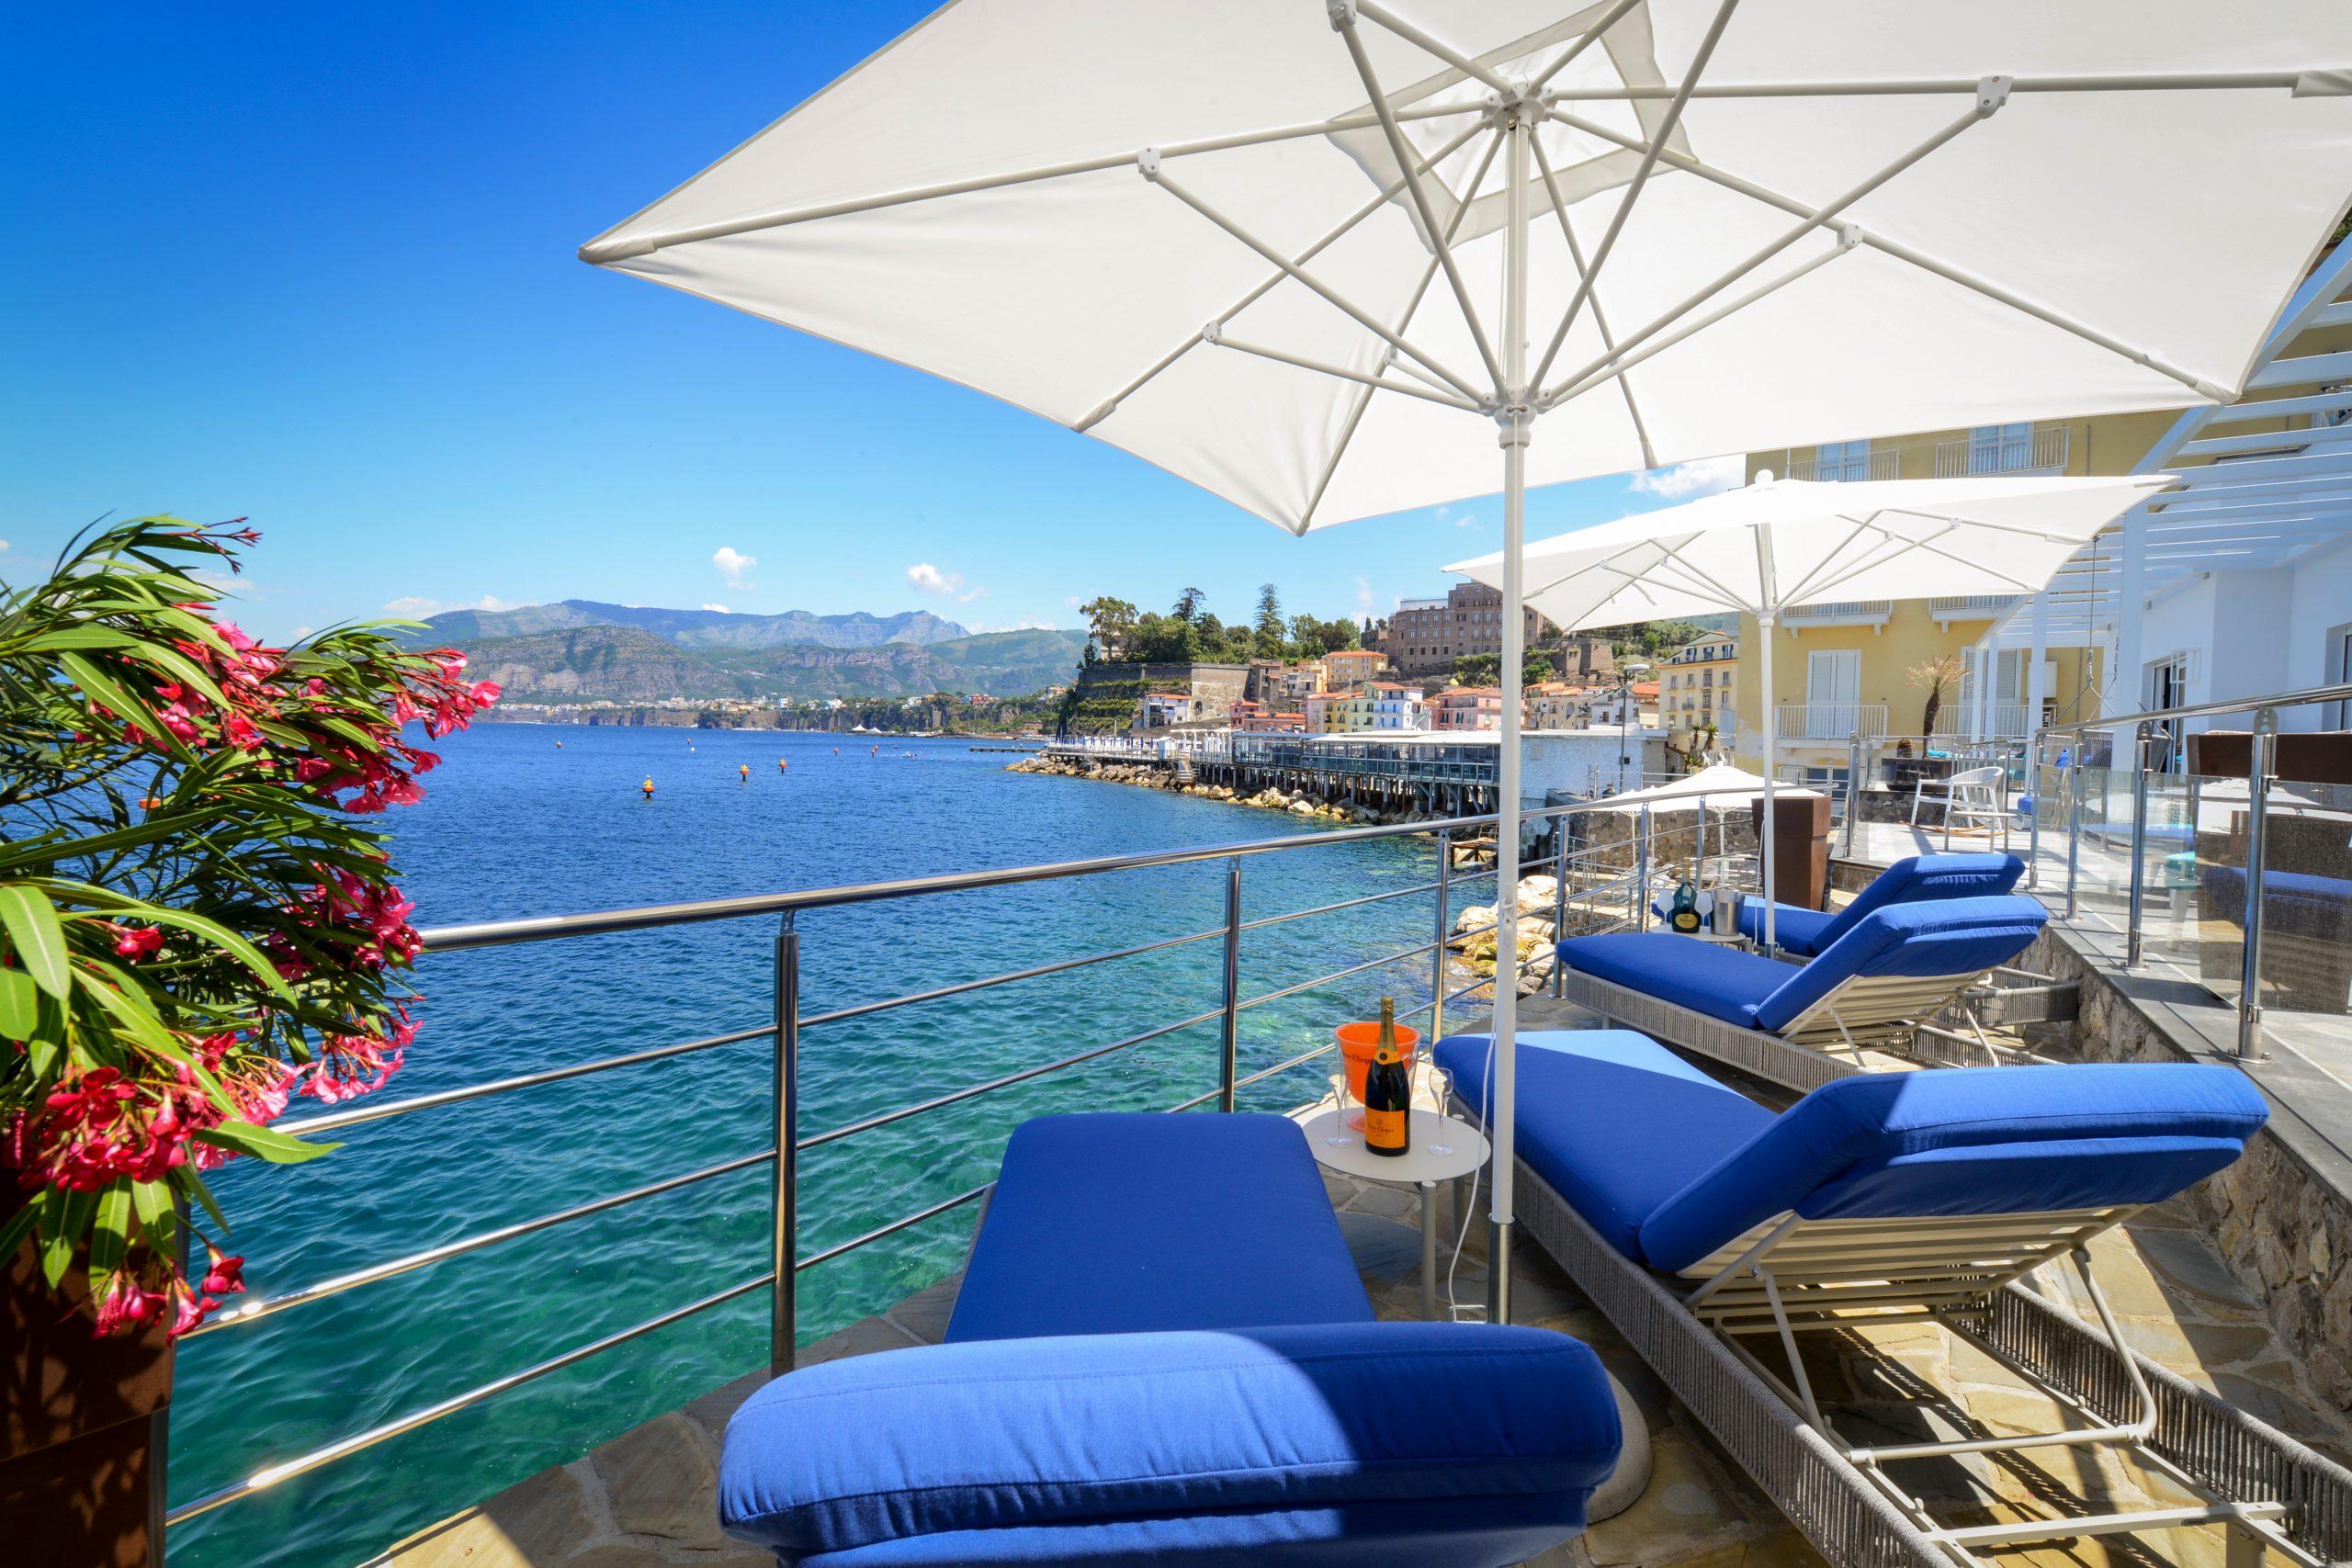 Villa Sorrento by the sea Pool Private Dock and descent to the sea